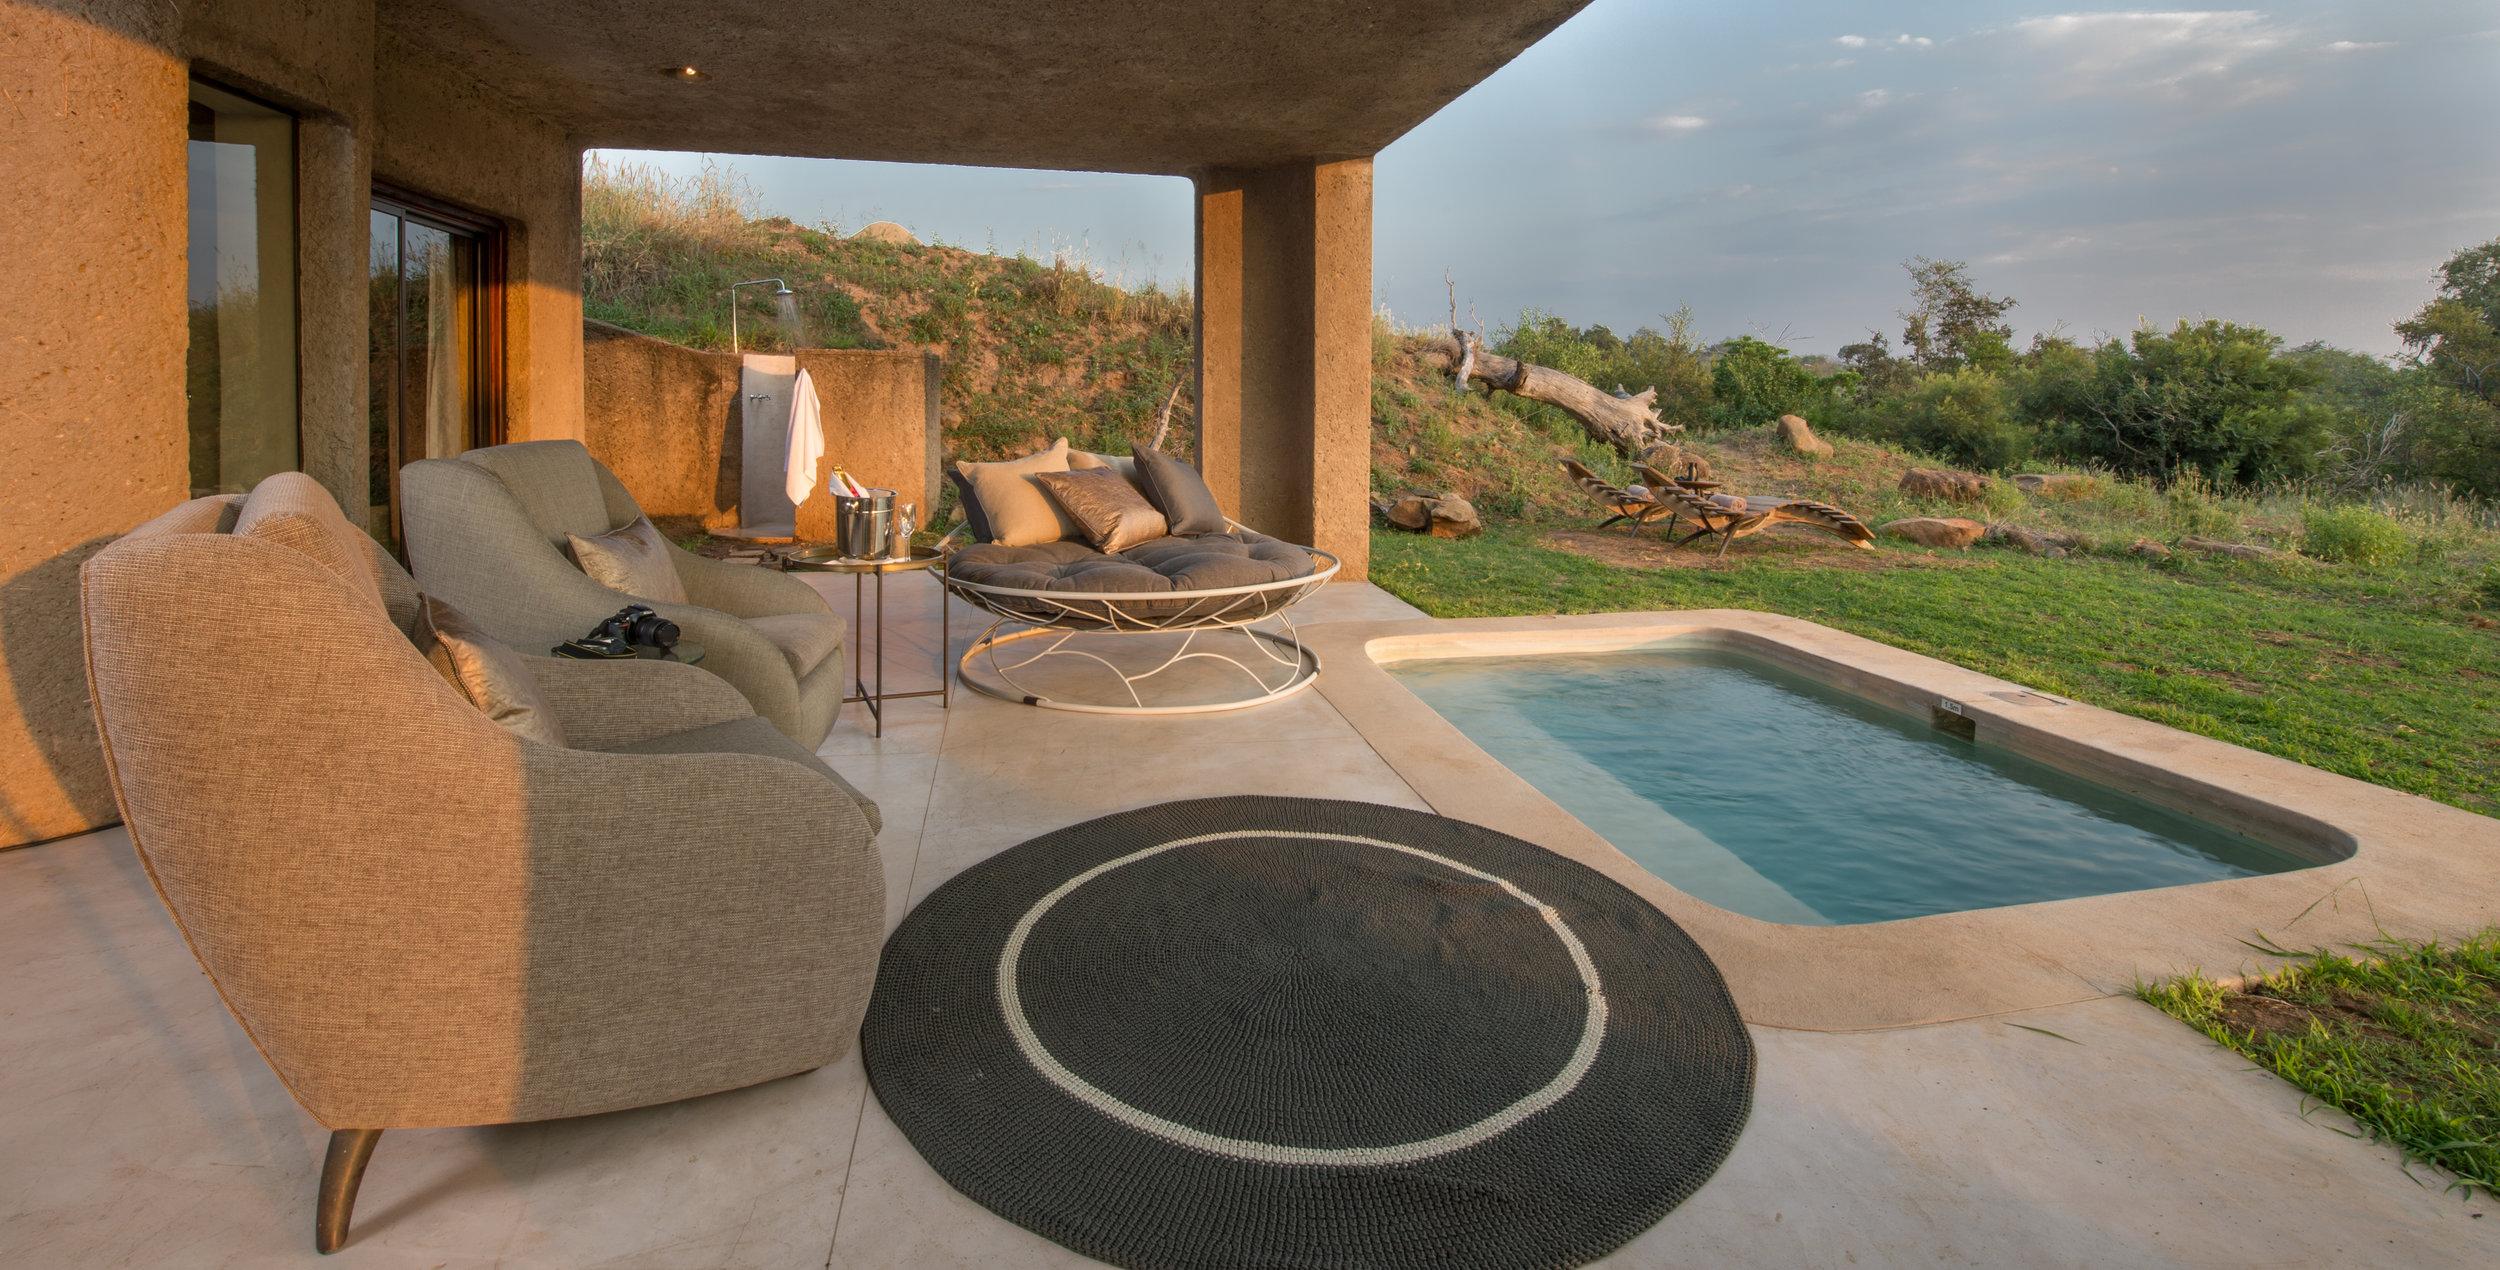 earth_lodge_-_suite_patio1.jpg